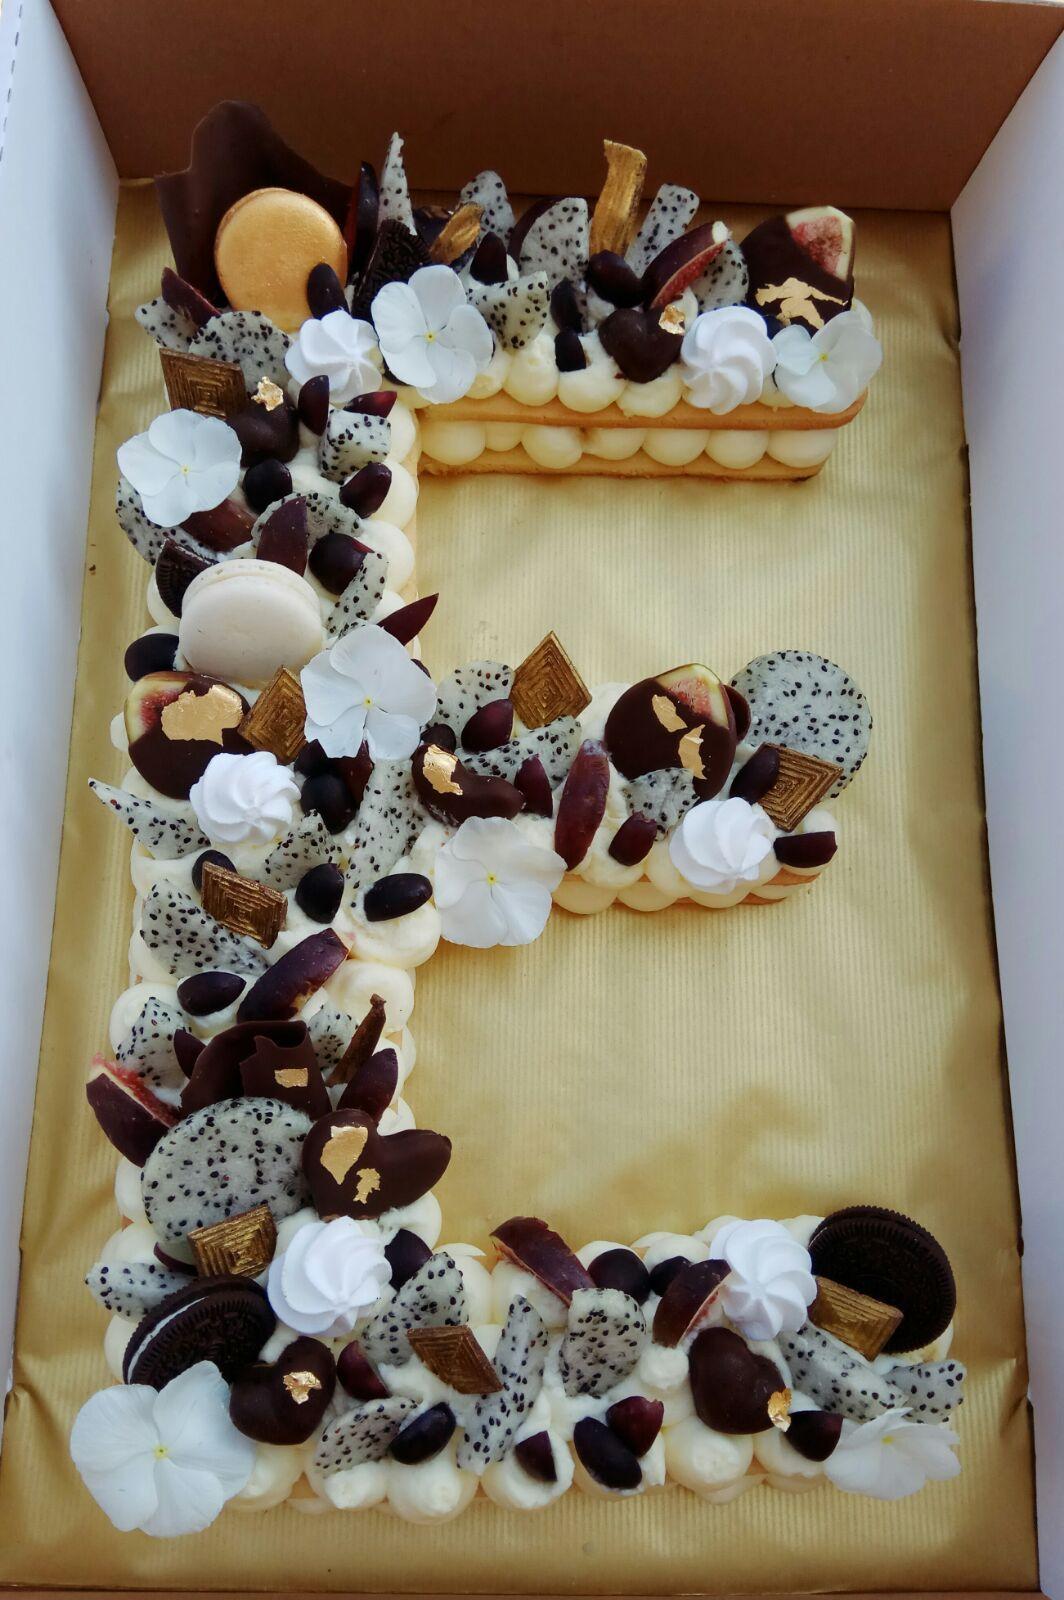 Fruit Cake Letter Cake Ecake Almont Tart Healthy Cake My Cakes